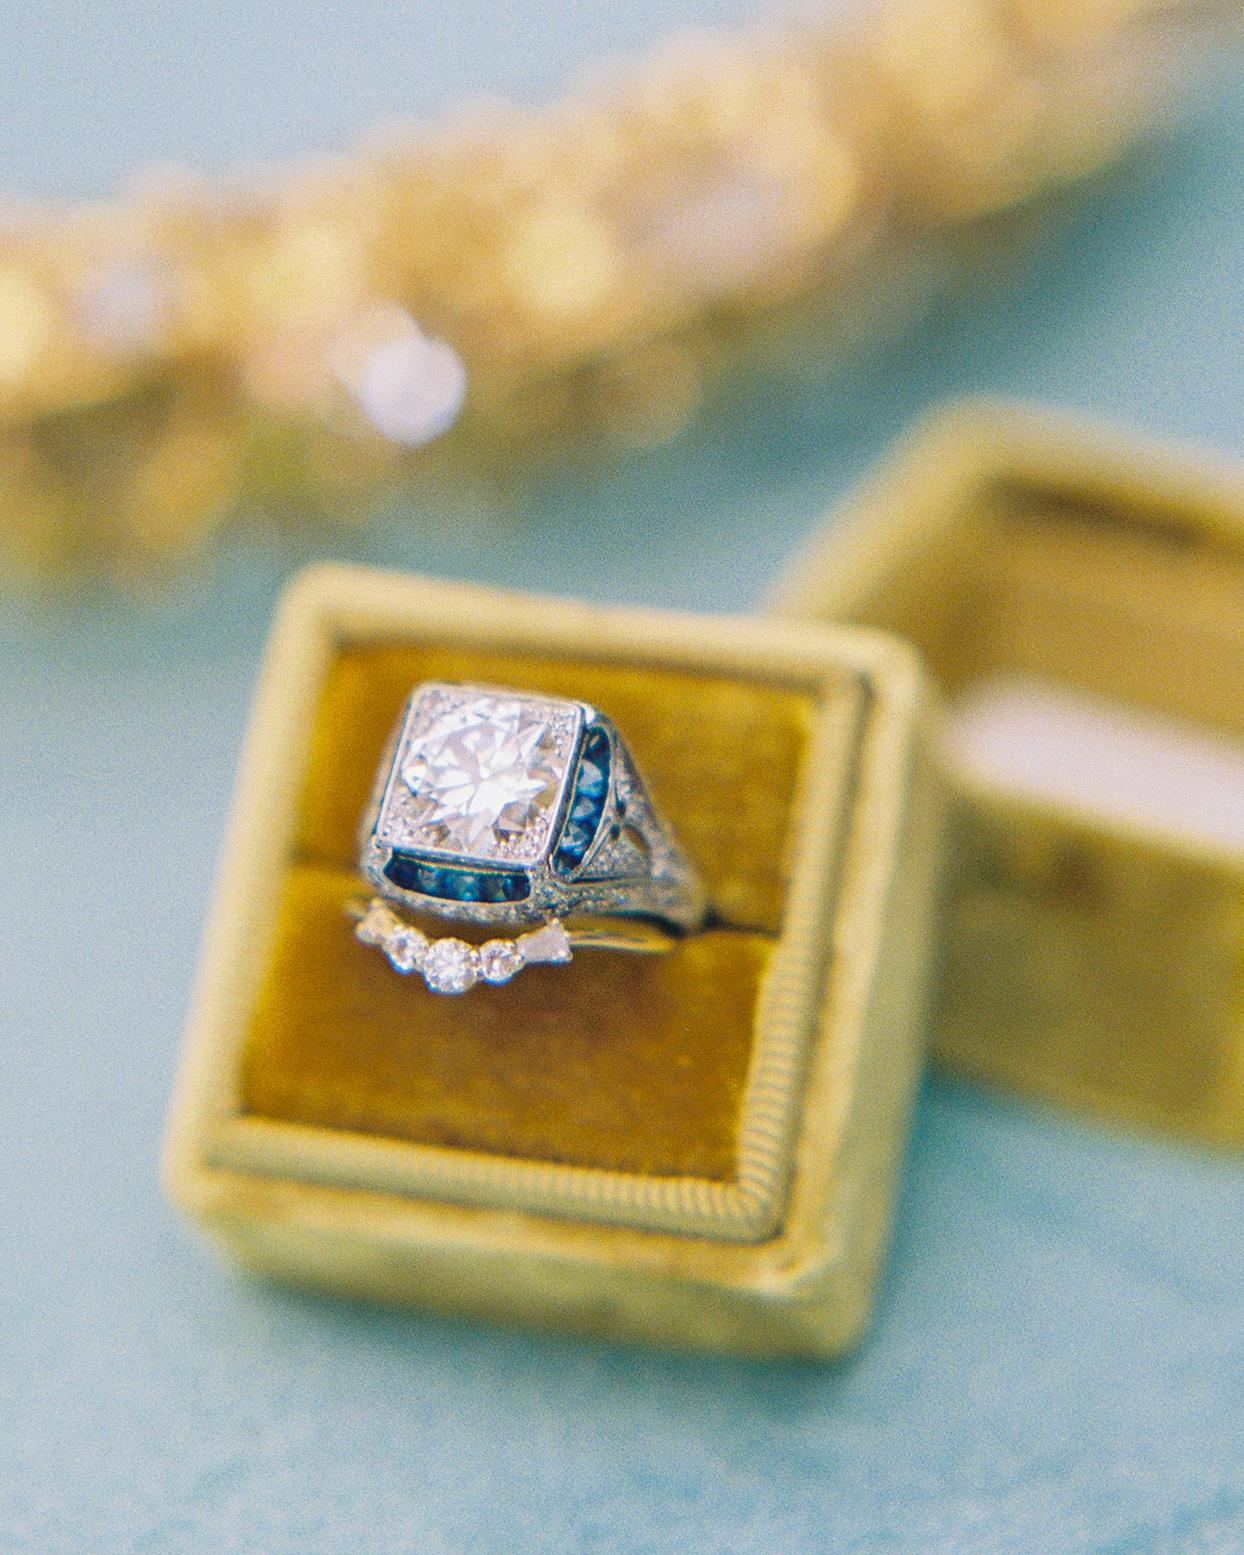 ashley scott wedding engagement ring in yellow box